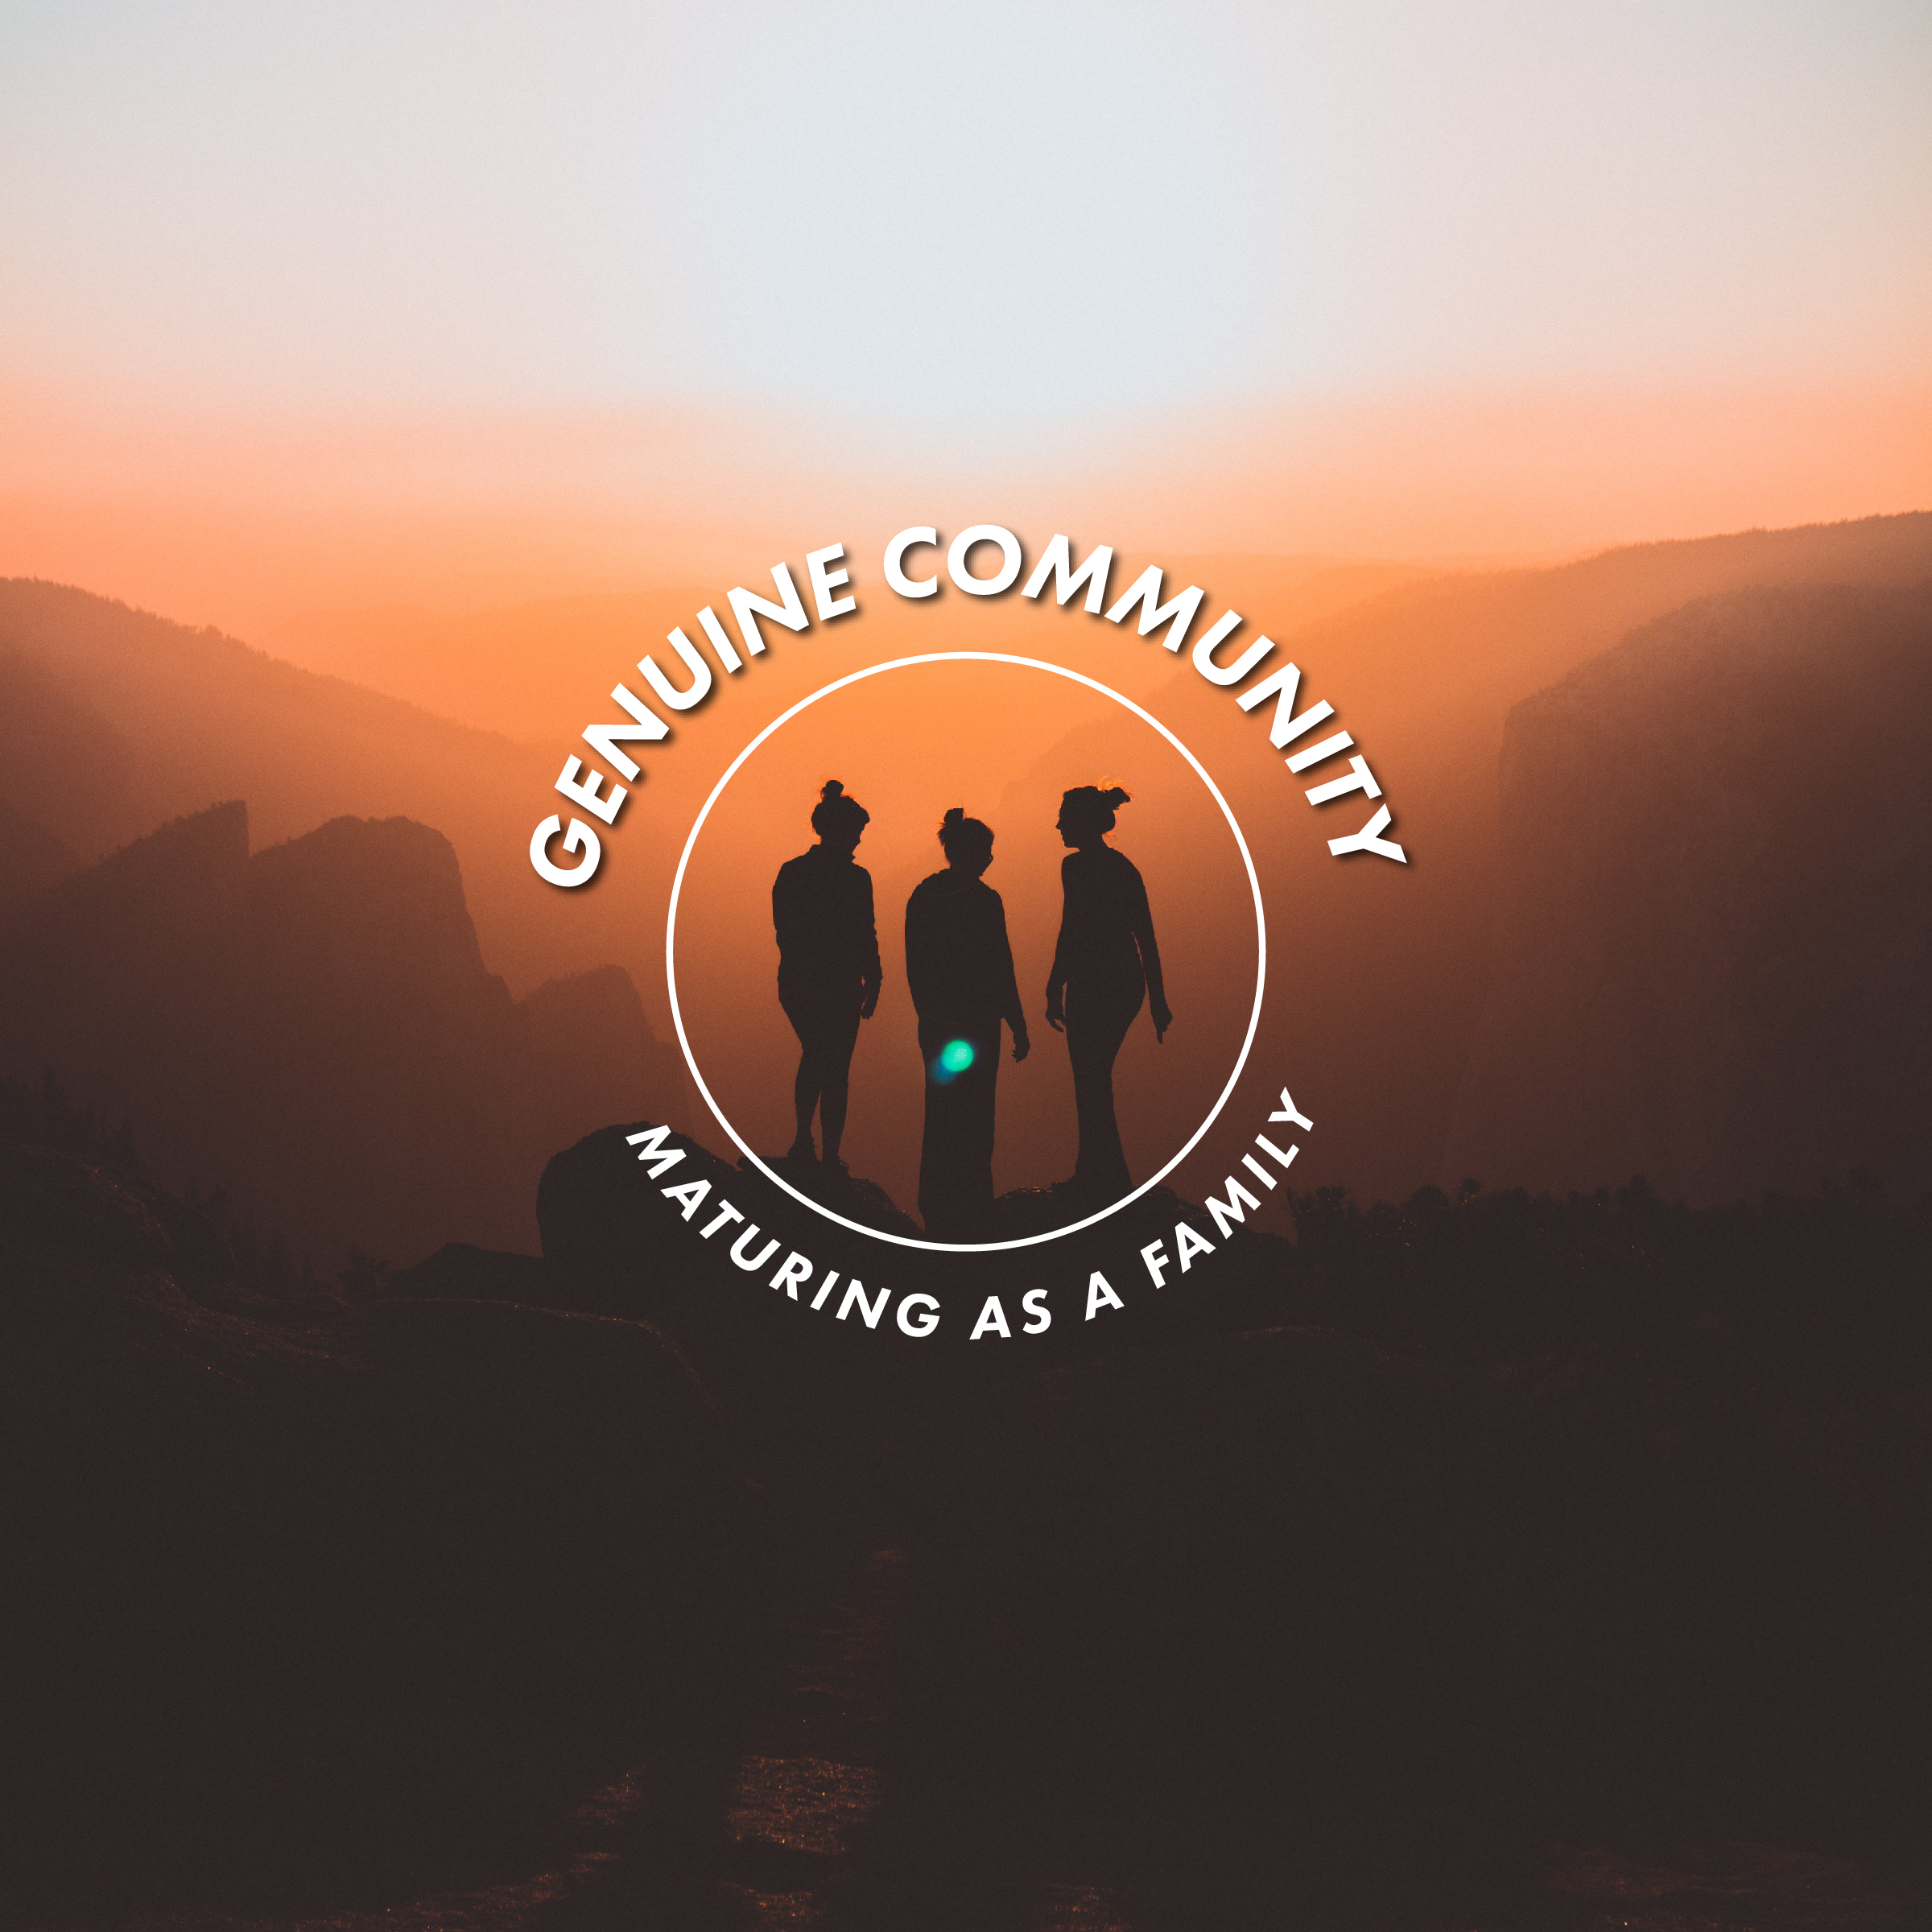 Genuine Community: Maturing as a Family